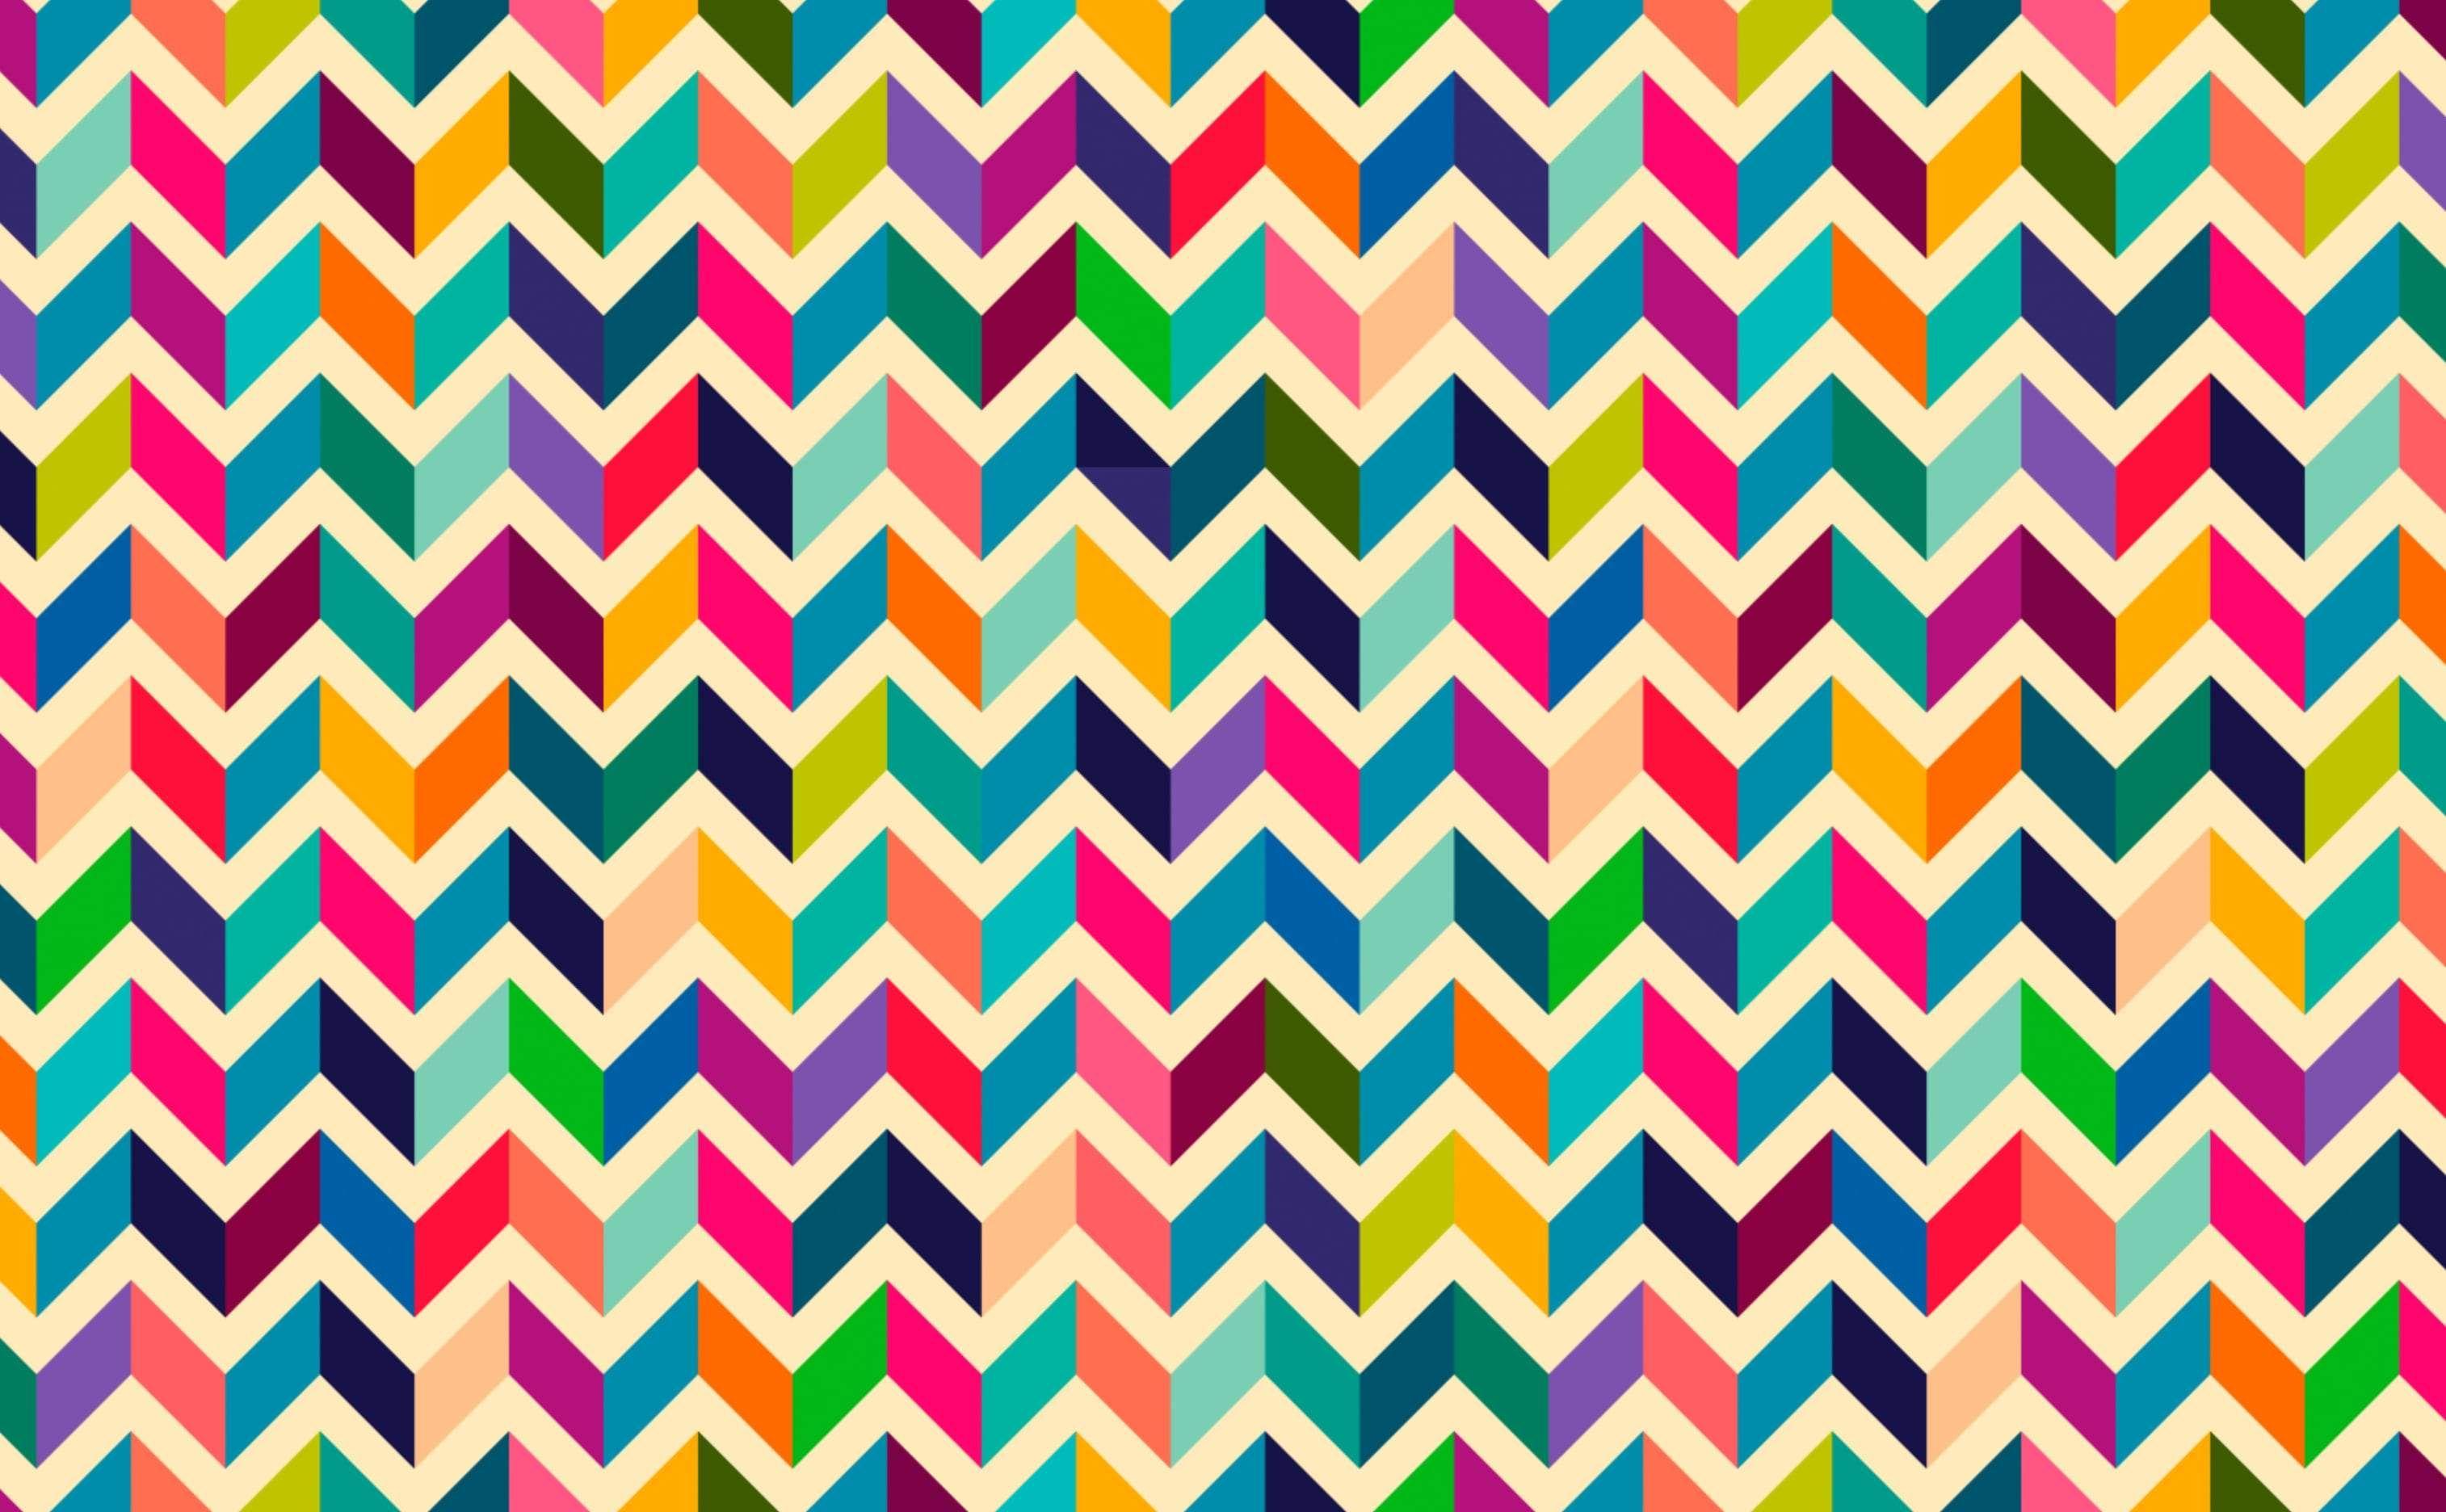 Dimensional Retro Pink And Purple Wallpaper Chevron Wallpaper Chevron Pattern Background